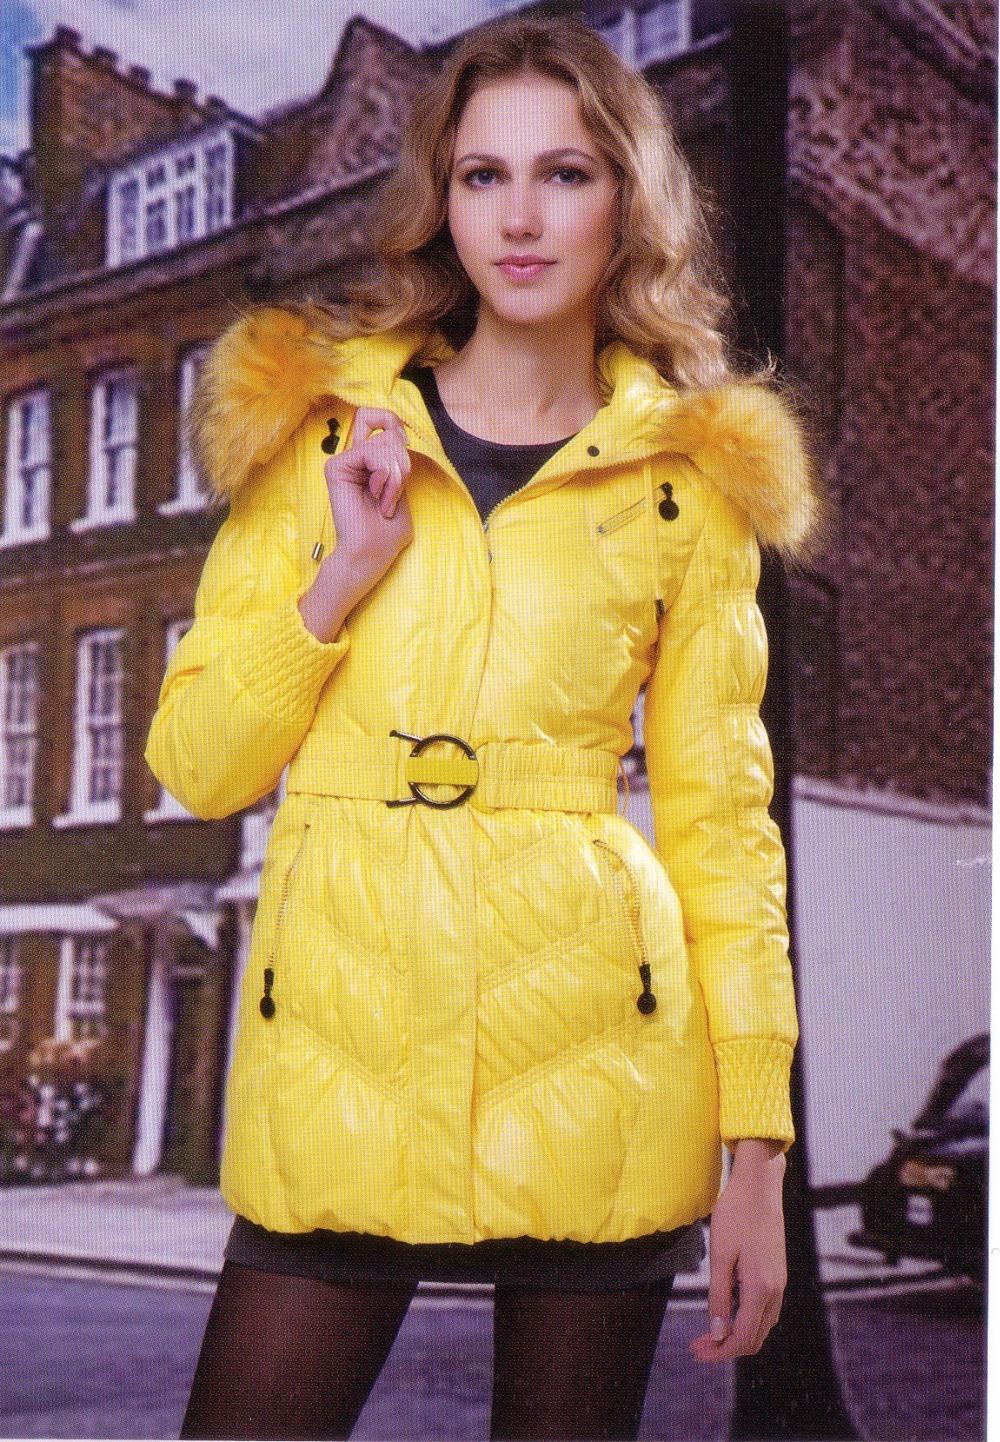 2015 Winter Coats Women Jackets Fashion Hooded Large Raccoon Fur Collar 90 White Goose Slim High-end Ladies & Parkas - Beautiful store